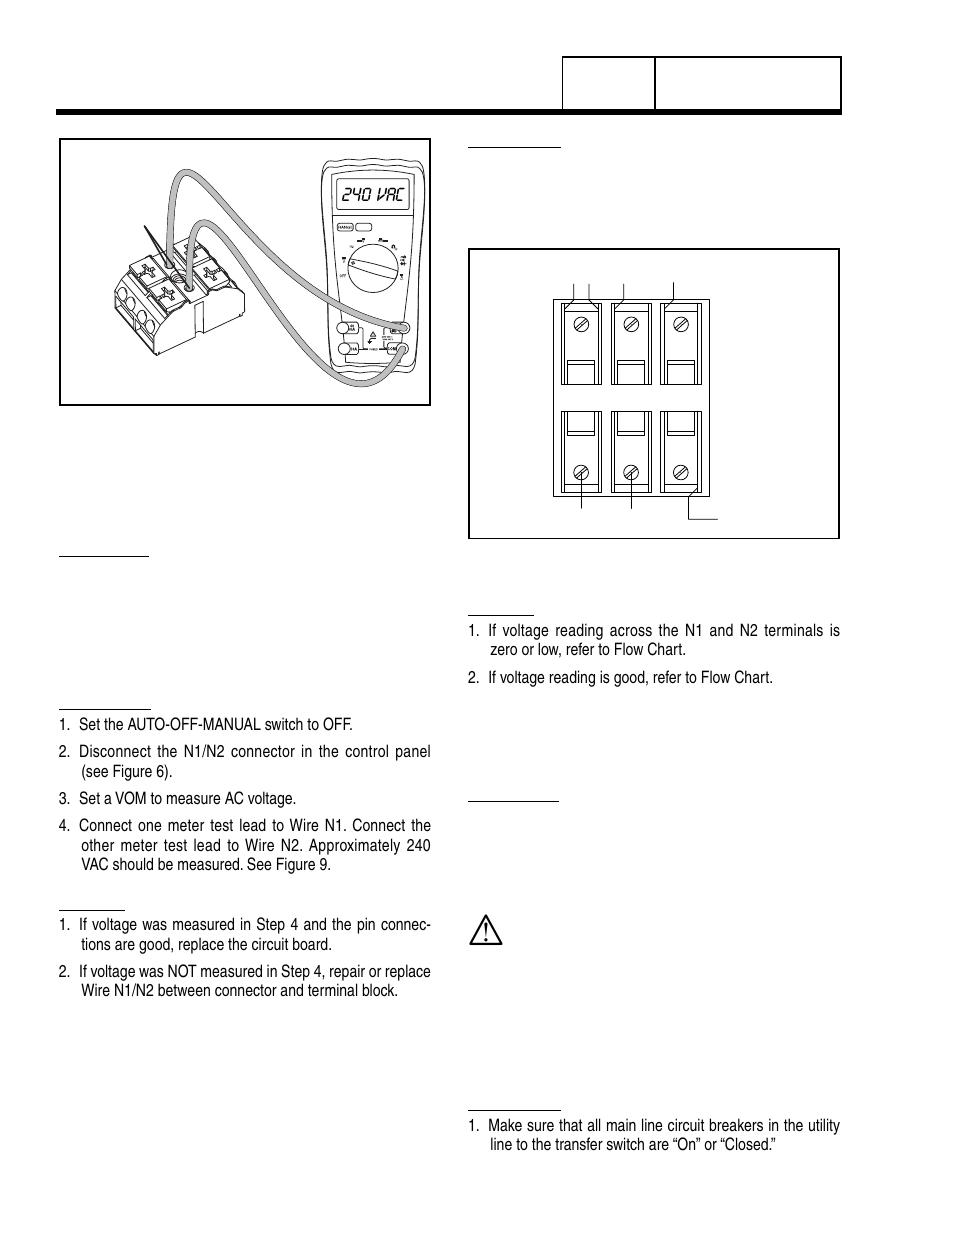 test 38 check utility sense voltage test 39 check voltage rh manualsdir com Manual Testing Resume Sample Software Testing